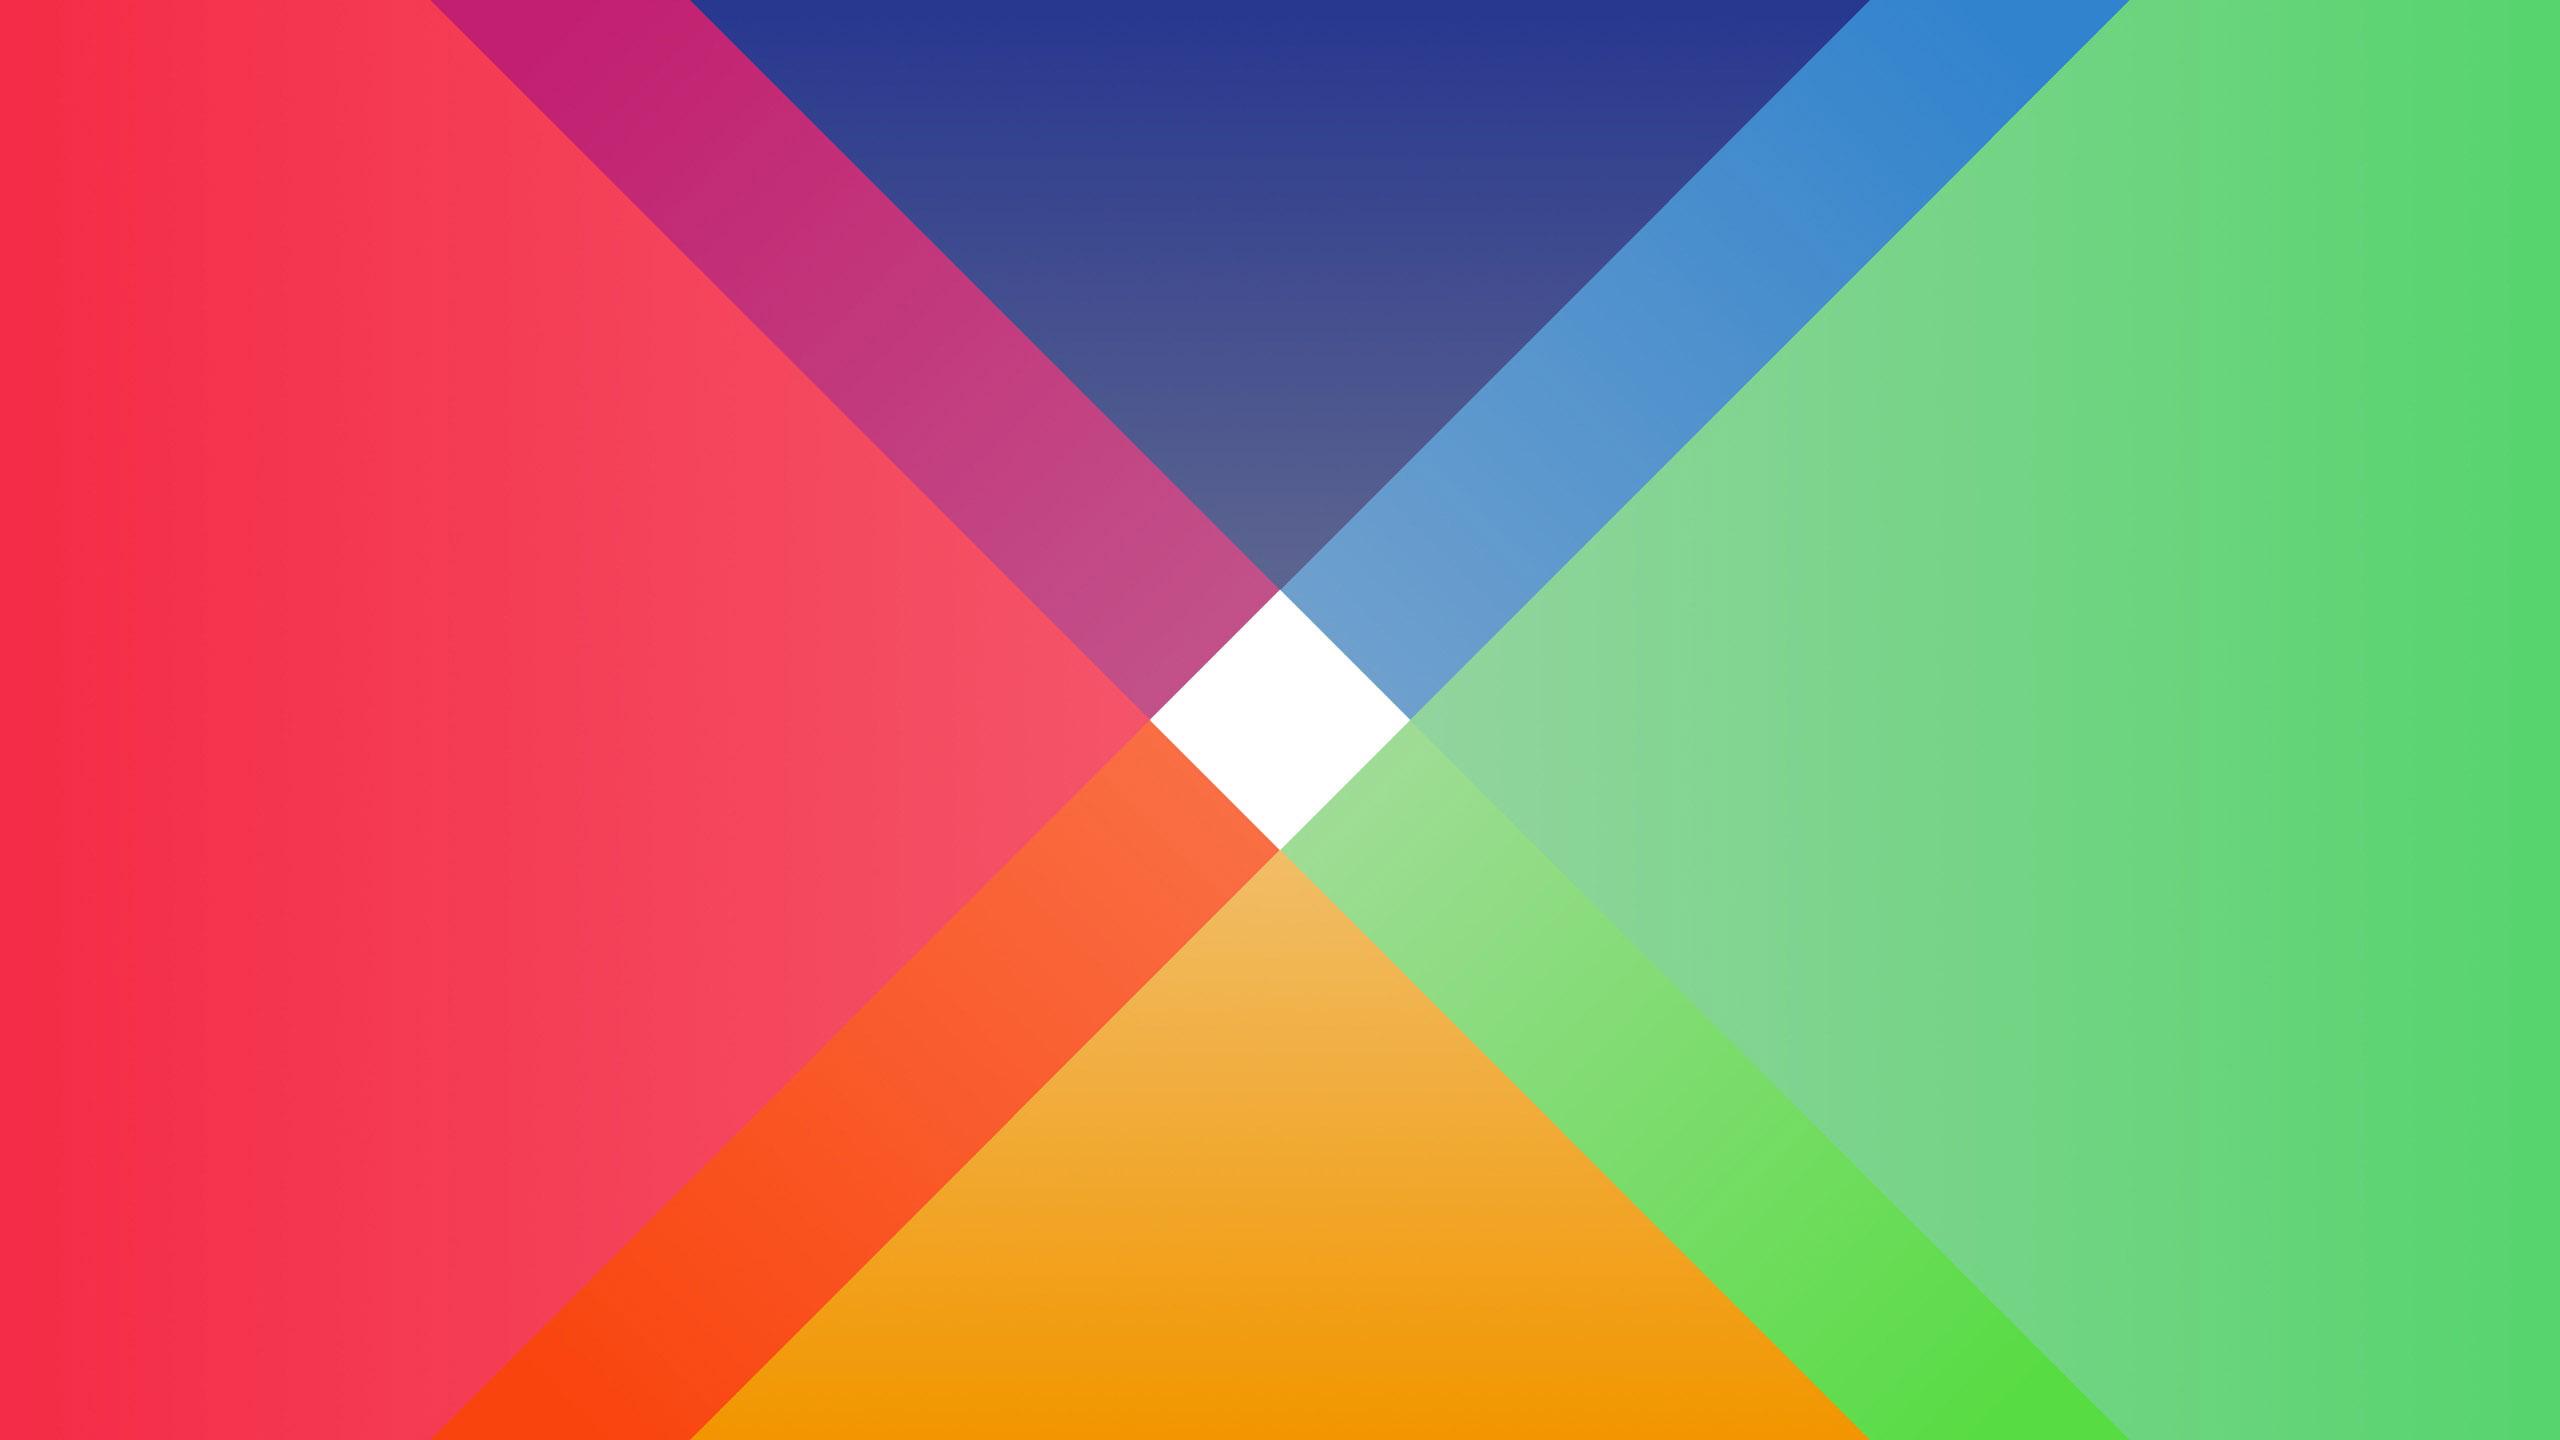 Colorful Minimalist Wallpaper 4k